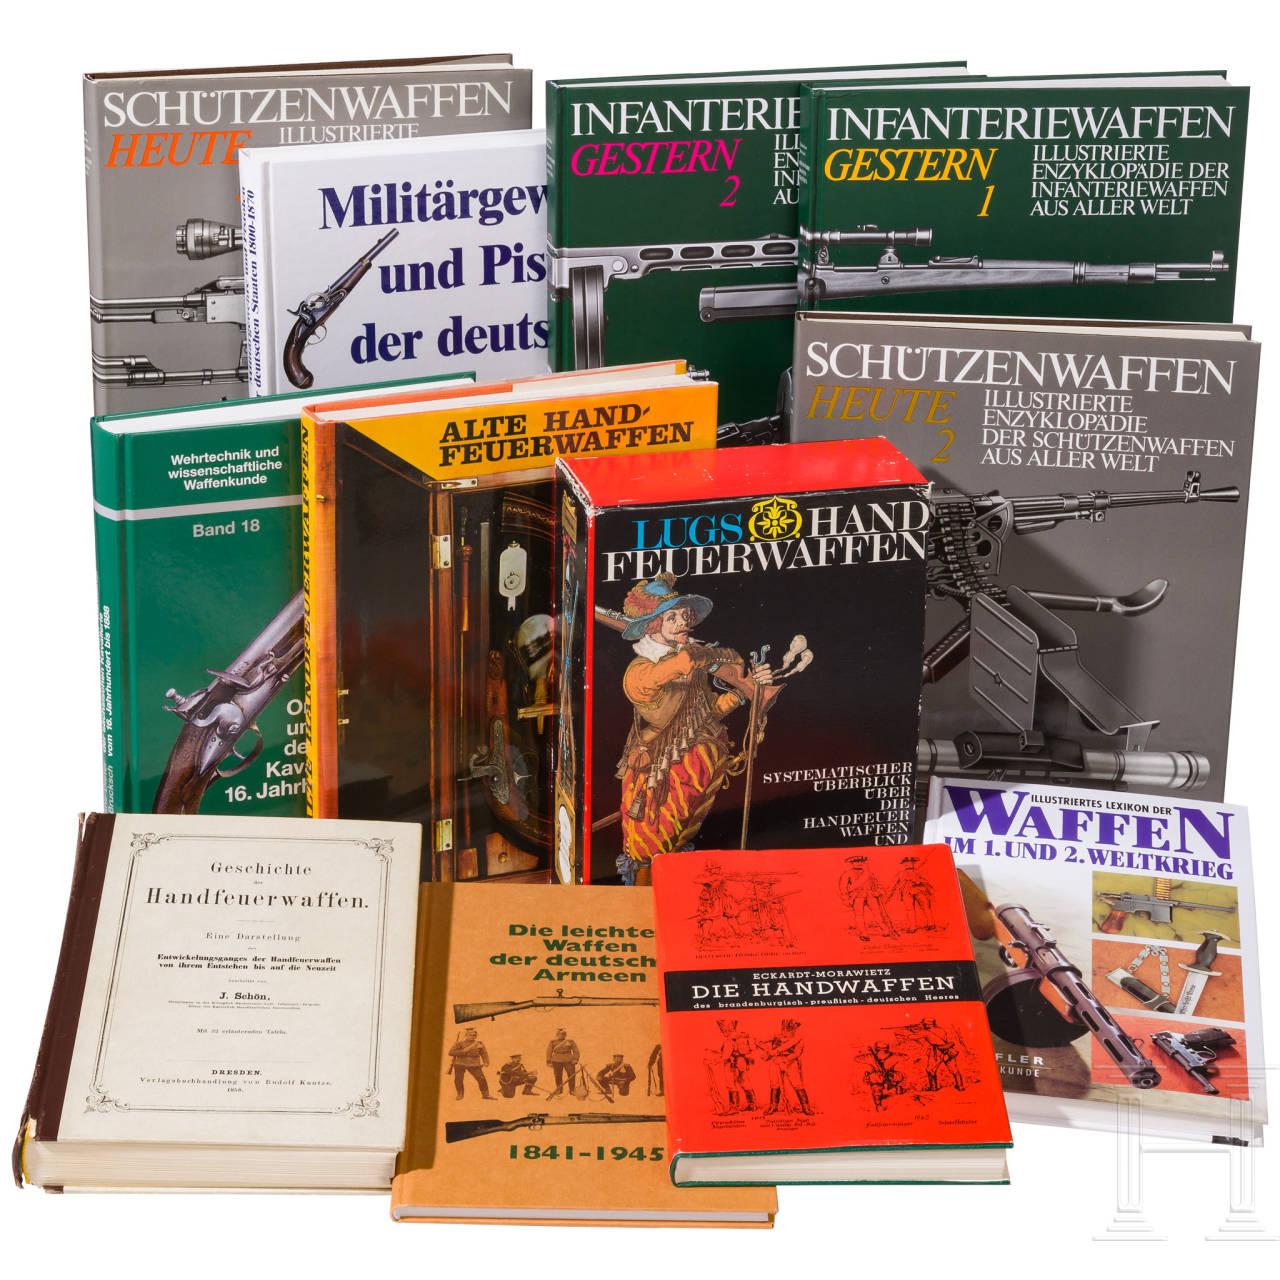 13 volumes of various gun literature